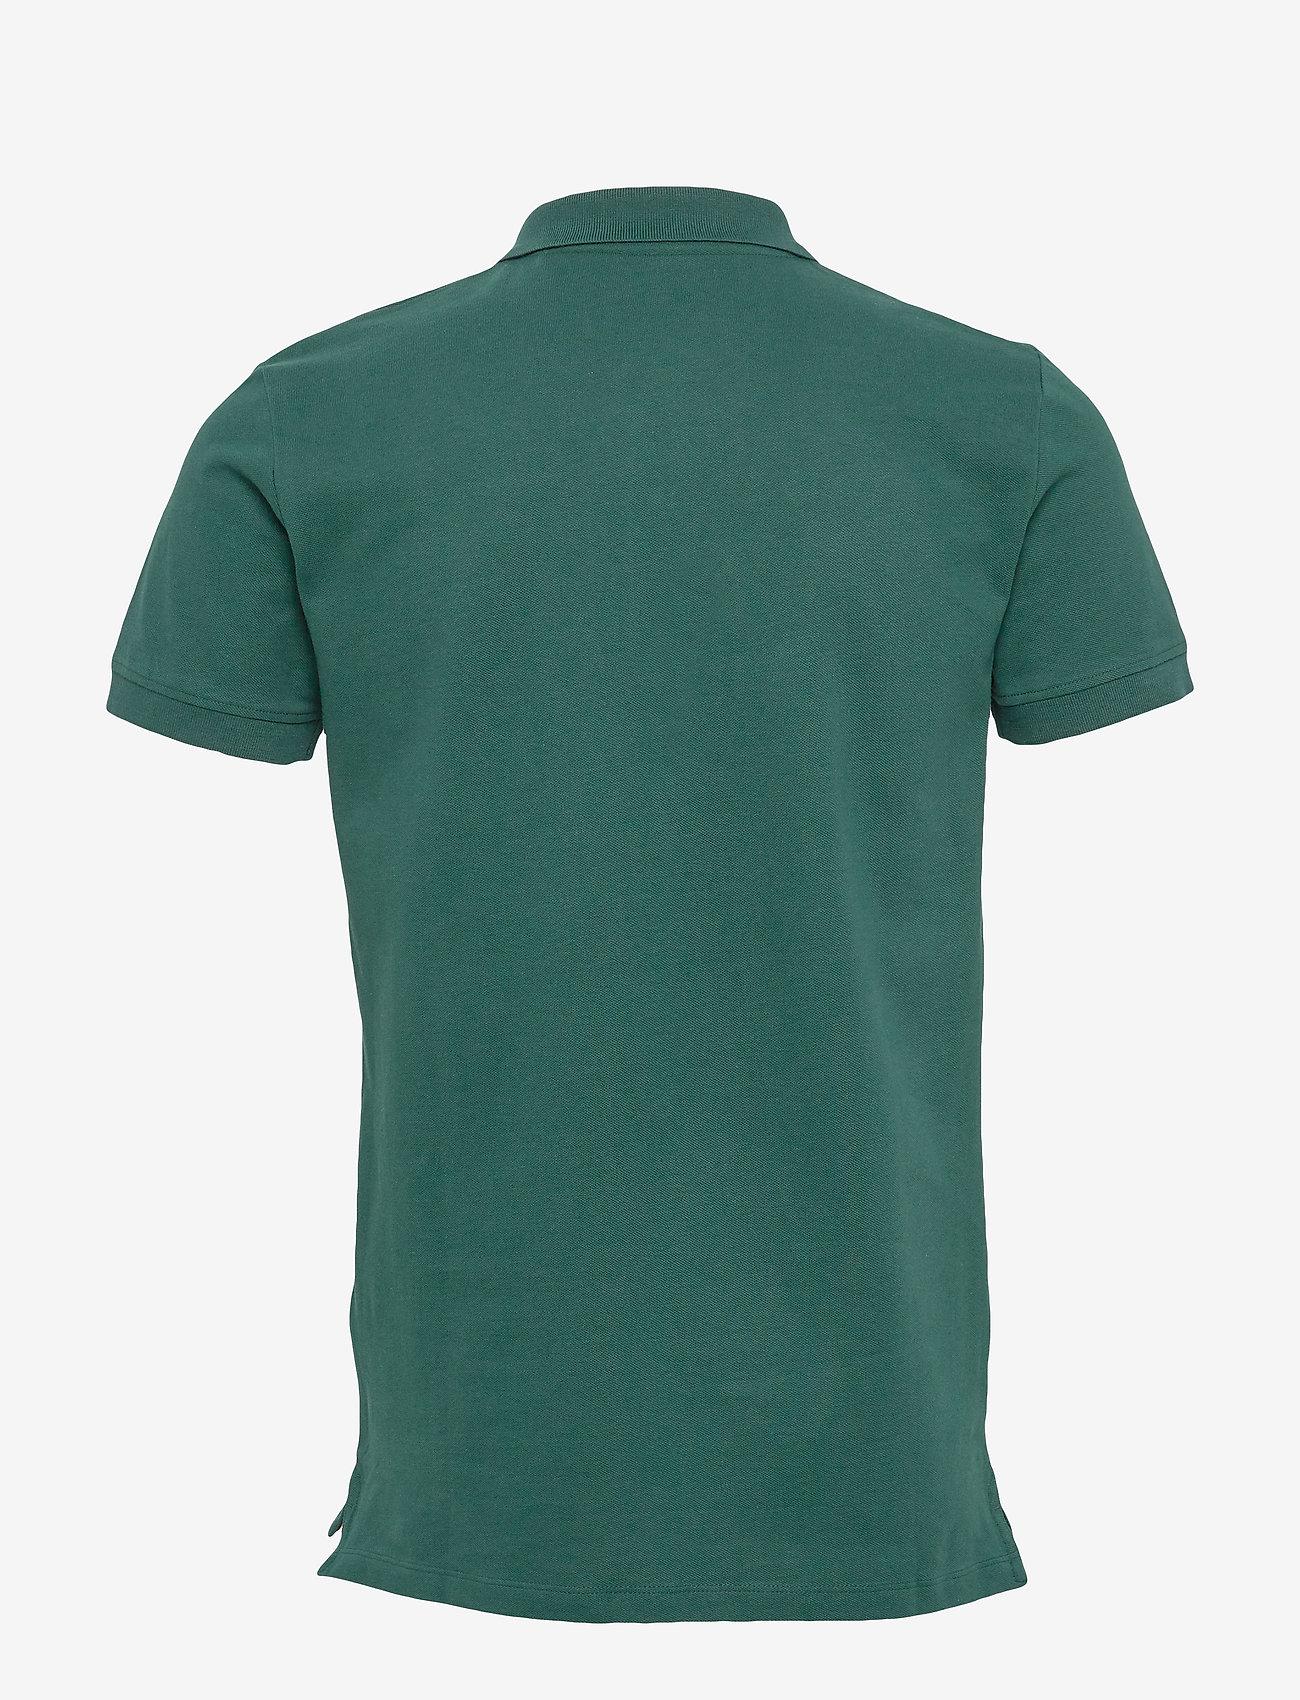 Esprit Casual Polo shirts - Poloskjorter DARK GREEN - Menn Klær